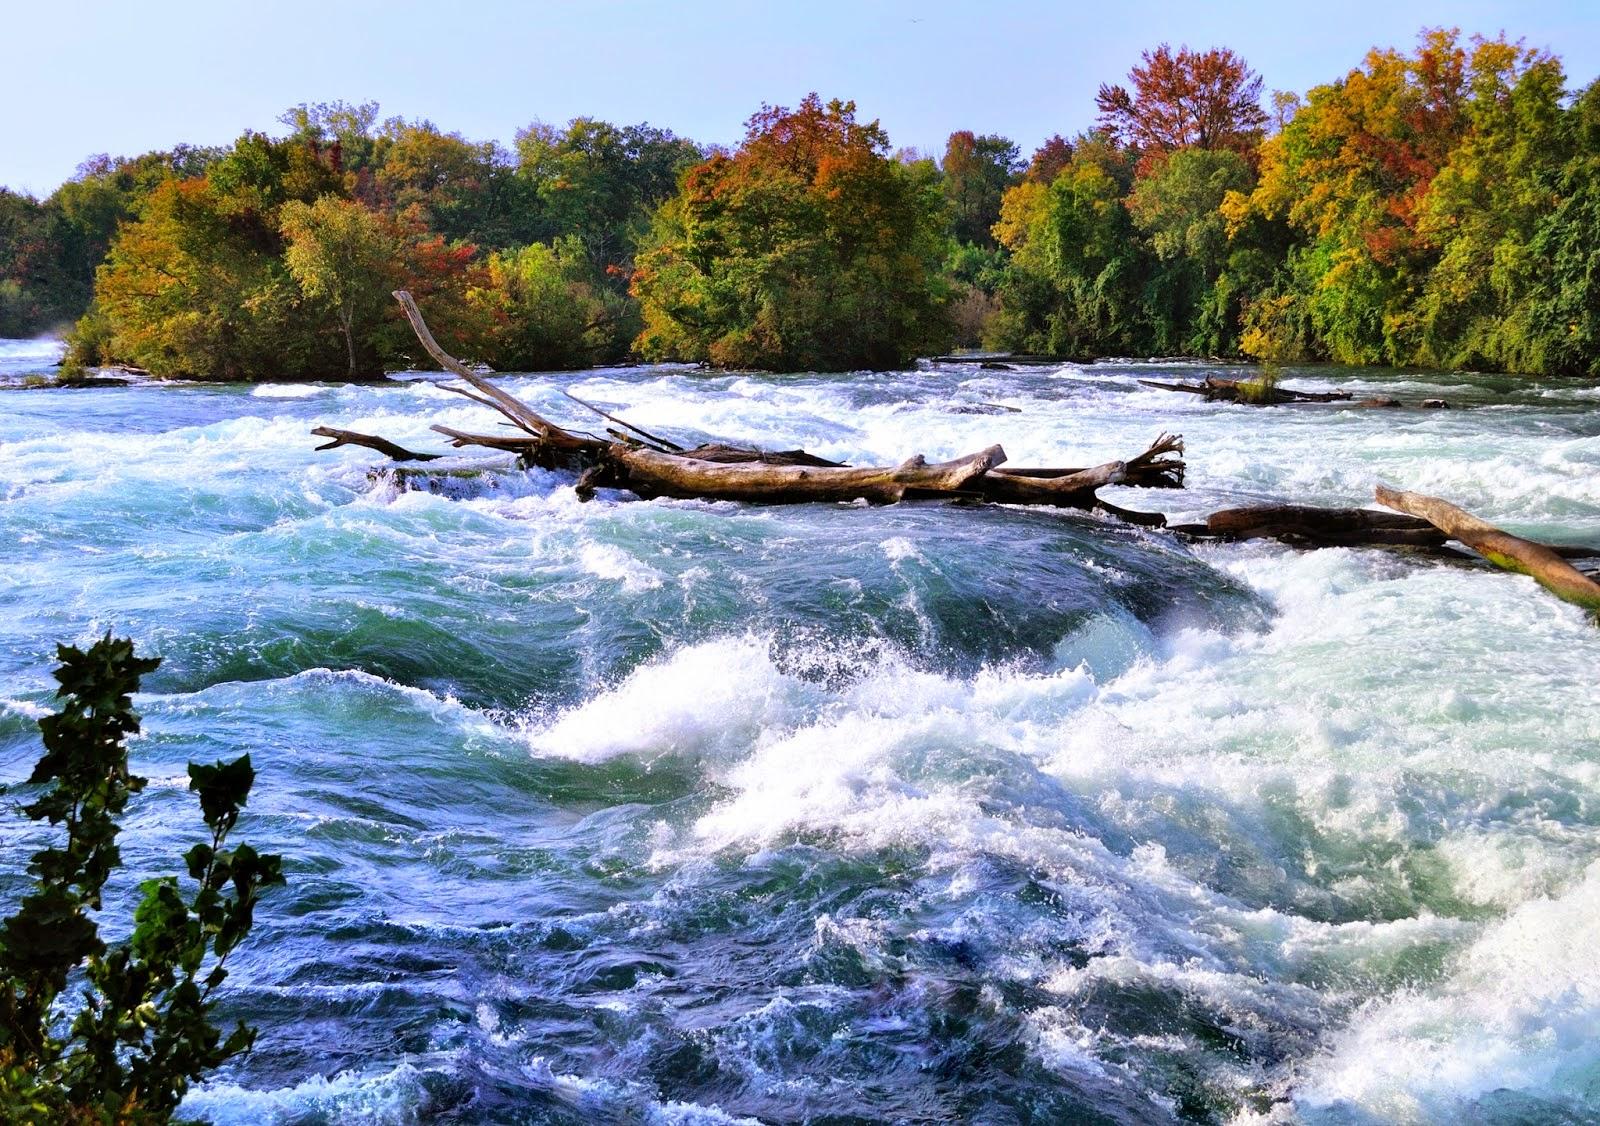 Paisajes naturales, cascadas y playas